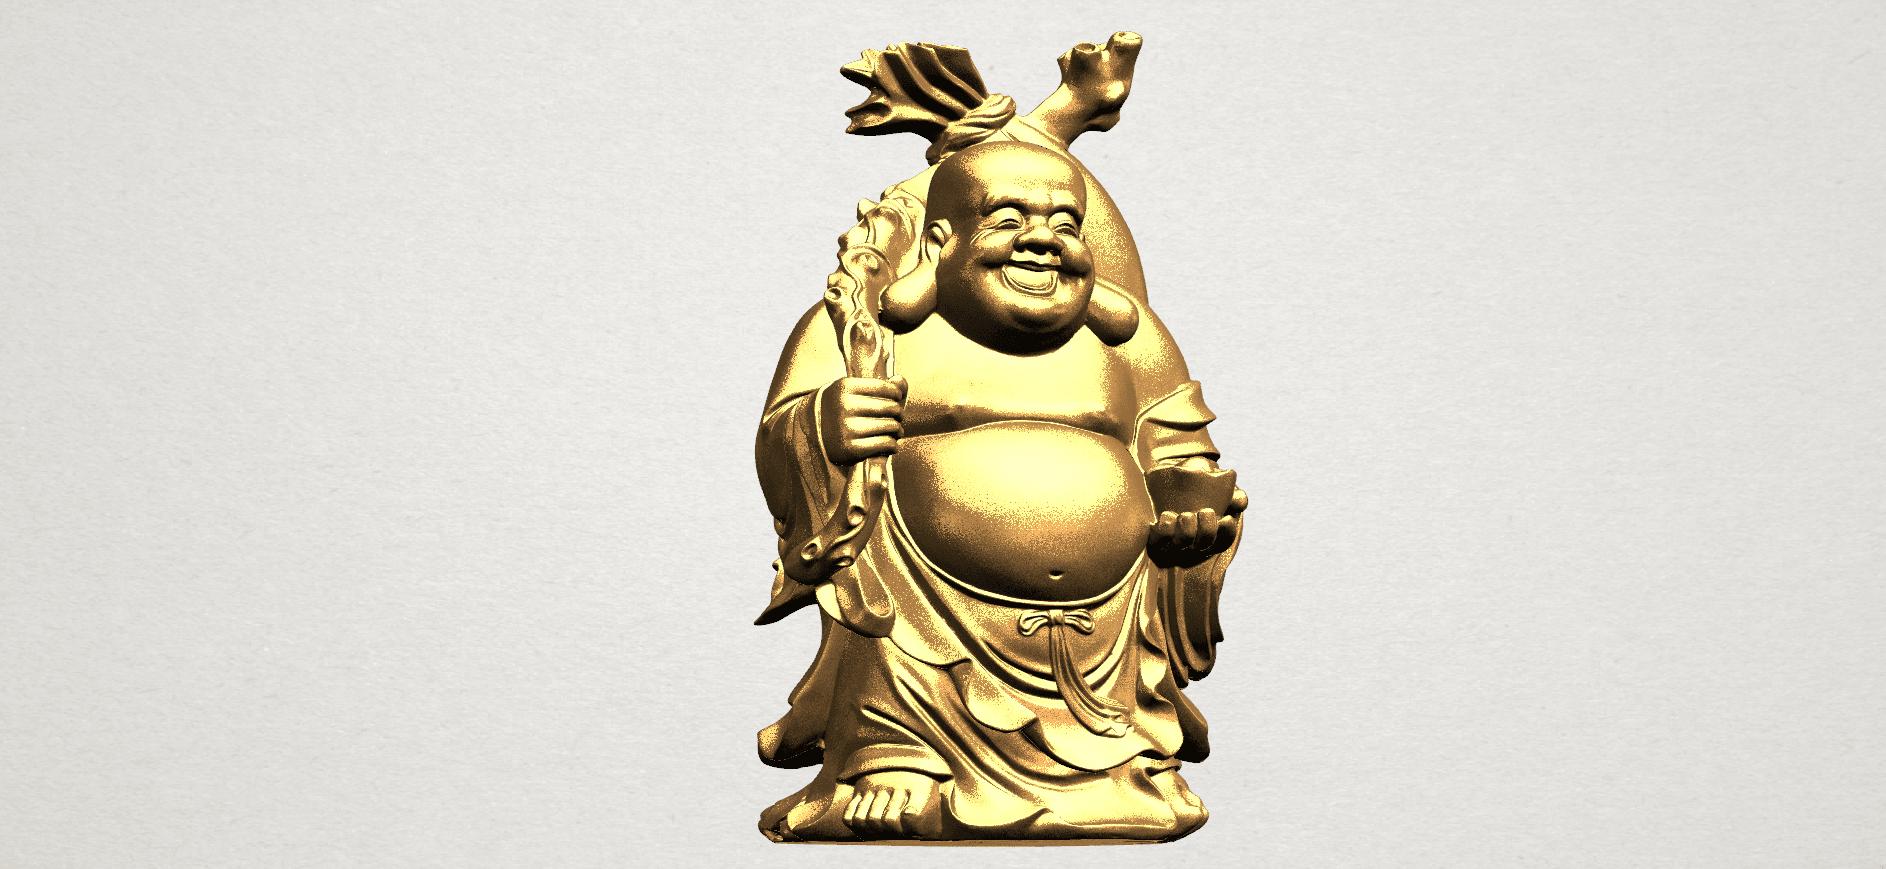 Metteyya Buddha 05 - 88mm - A01.png Télécharger fichier STL gratuit Bouddha Metteyya 05 • Objet imprimable en 3D, GeorgesNikkei